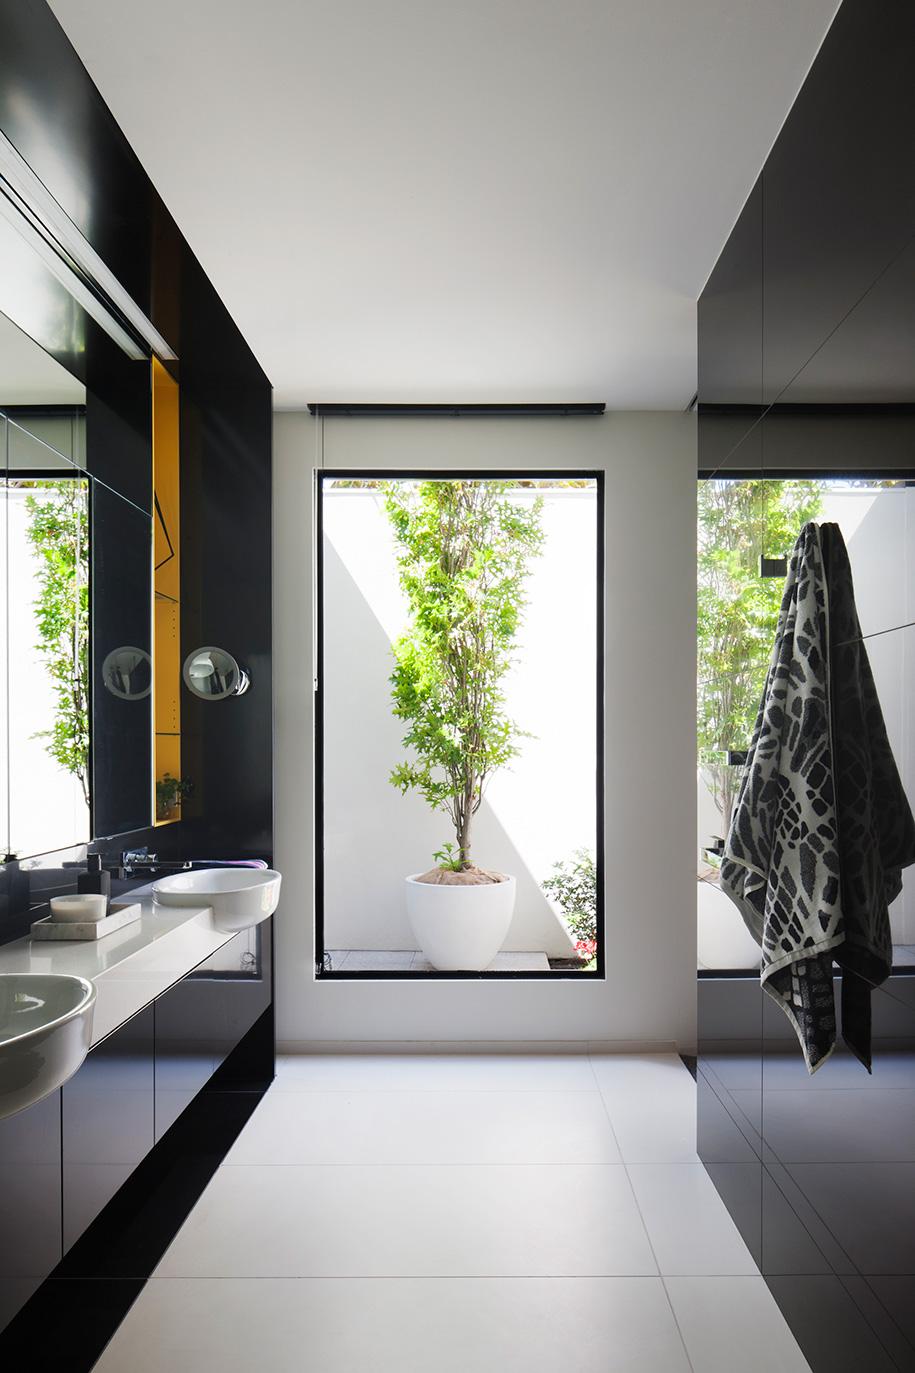 Field House Robert Puksand bathroom